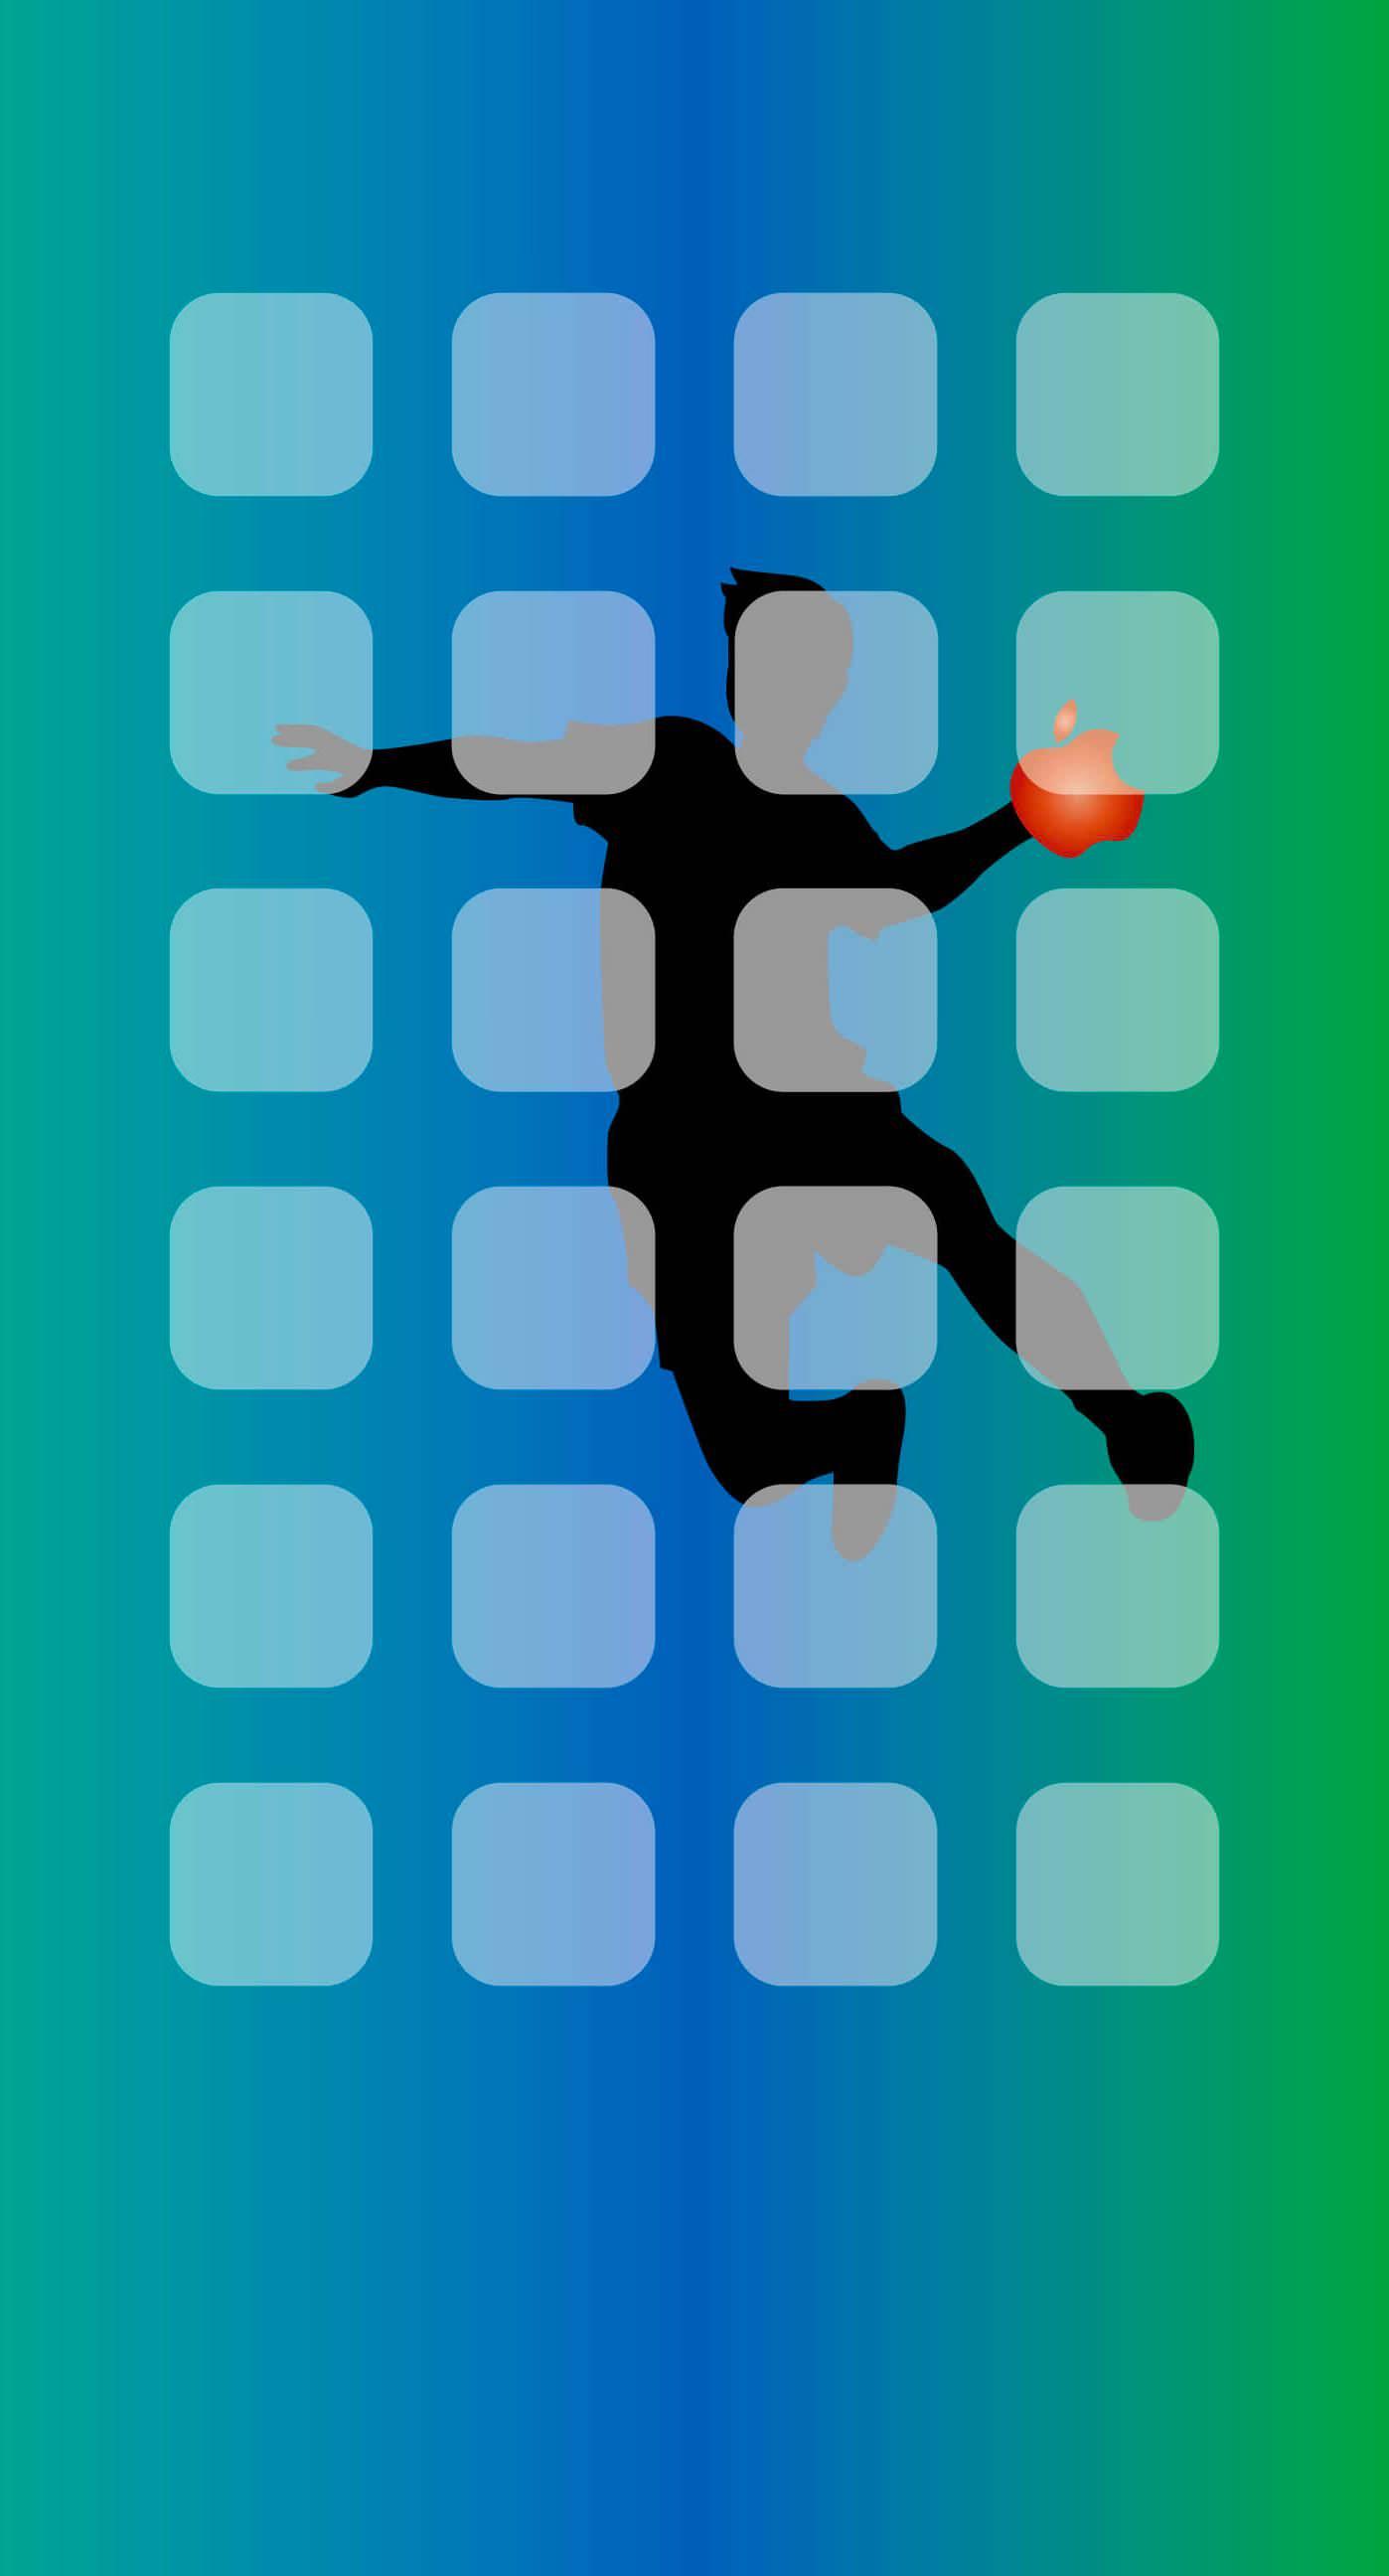 Shelf Apple logo patina handball wallpapersc iPhone7Plus 1398x2592